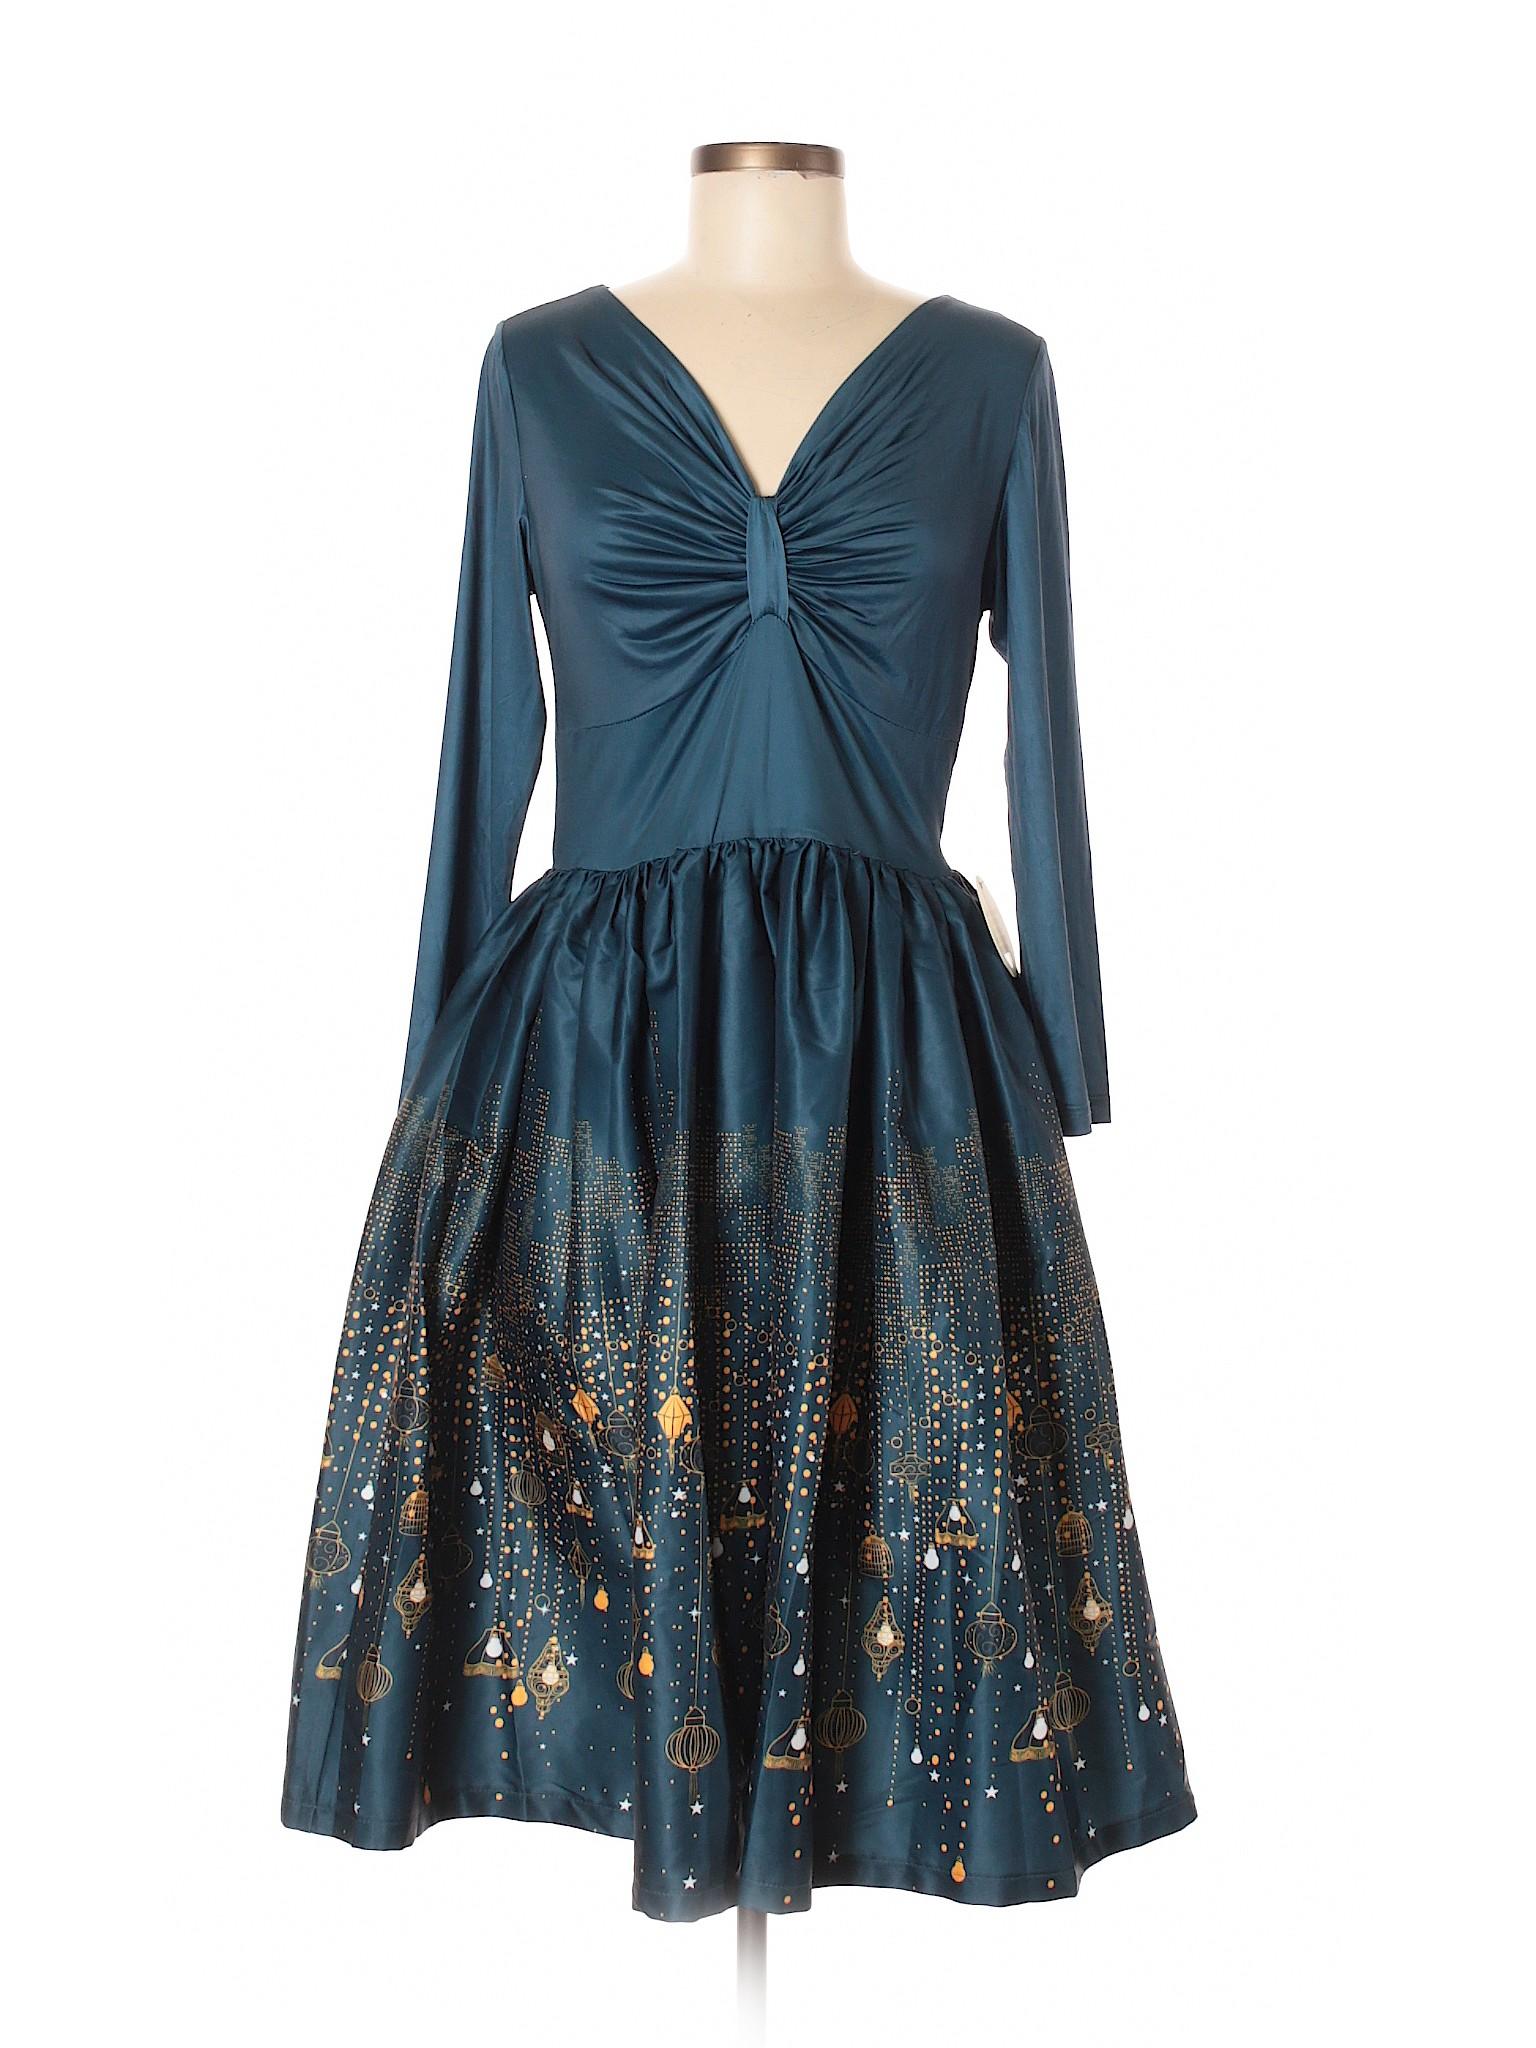 Selling Casual Selling Lindy Dress Lindy Bop 80x48wq6P